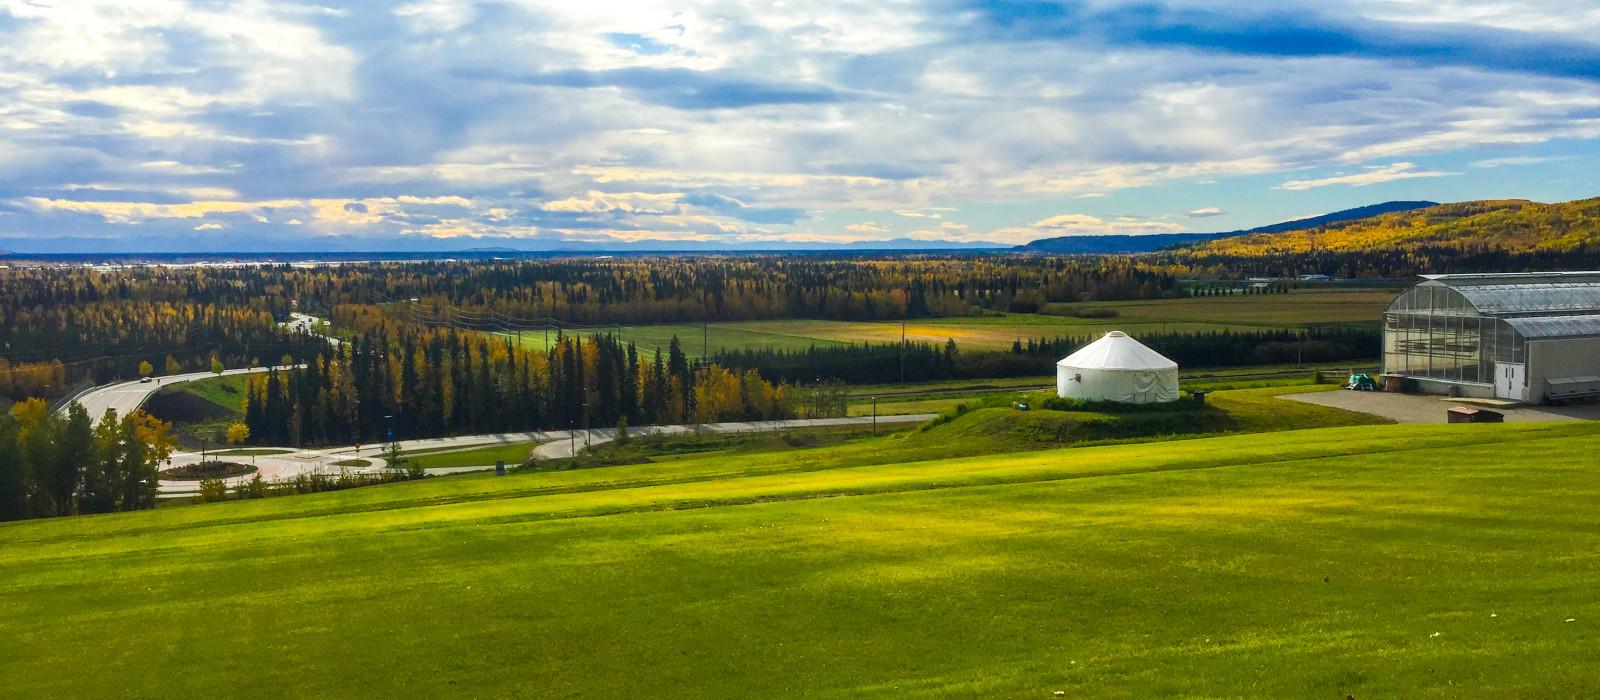 Reiseziel Fairbanks Alaska